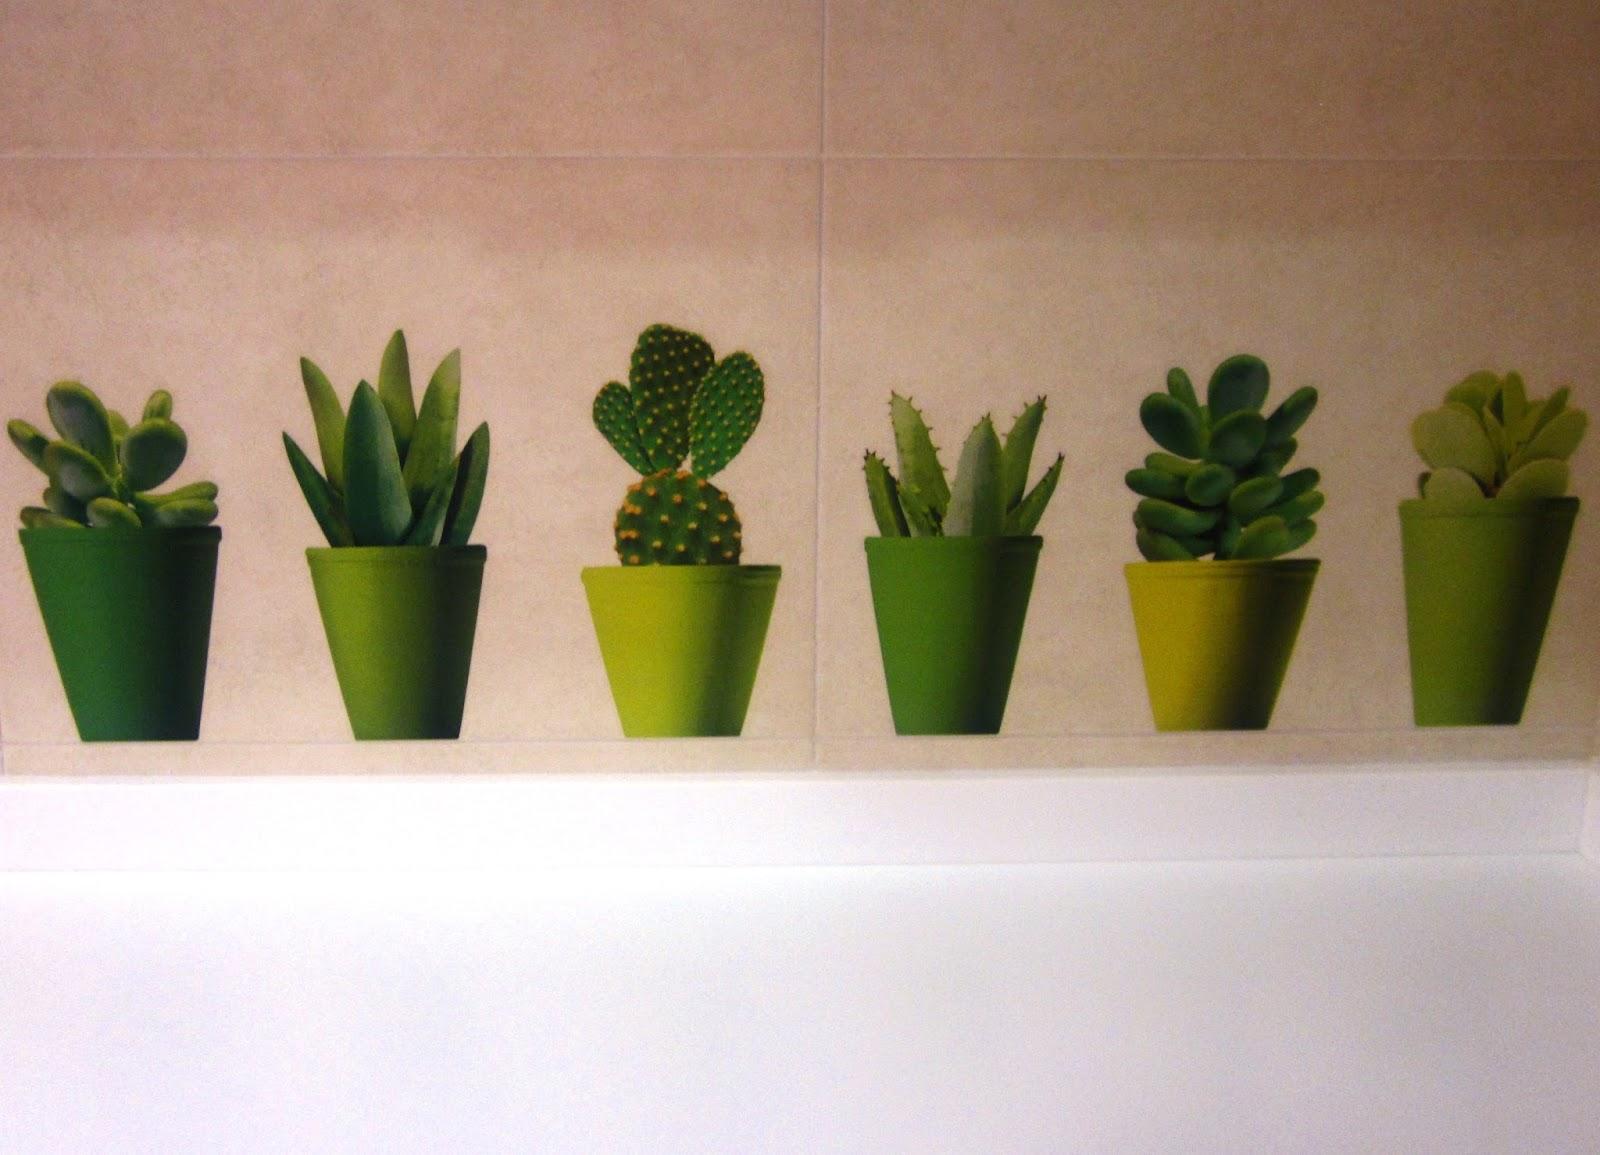 cactus leroy merlin stunning img with cactus leroy merlin. Black Bedroom Furniture Sets. Home Design Ideas